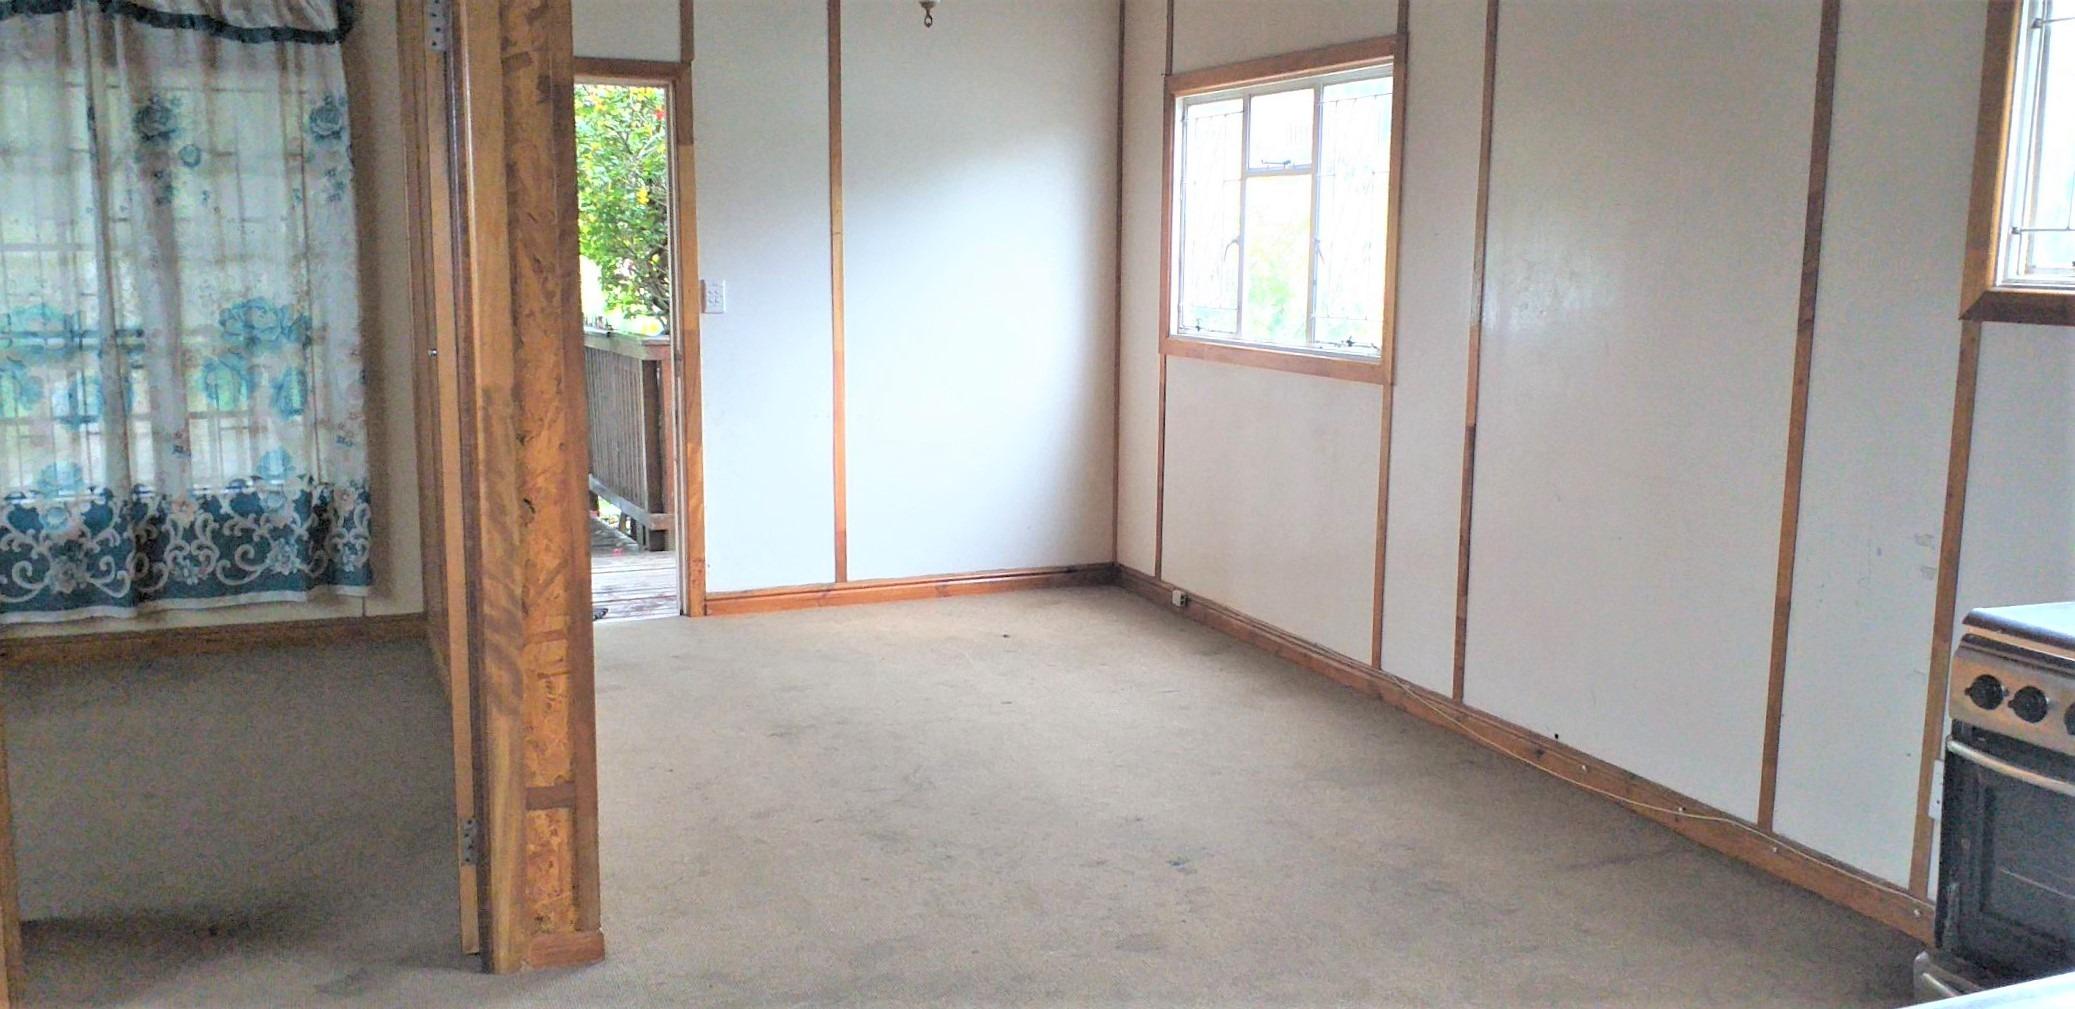 6 Bedroom House For Sale in Hornlee